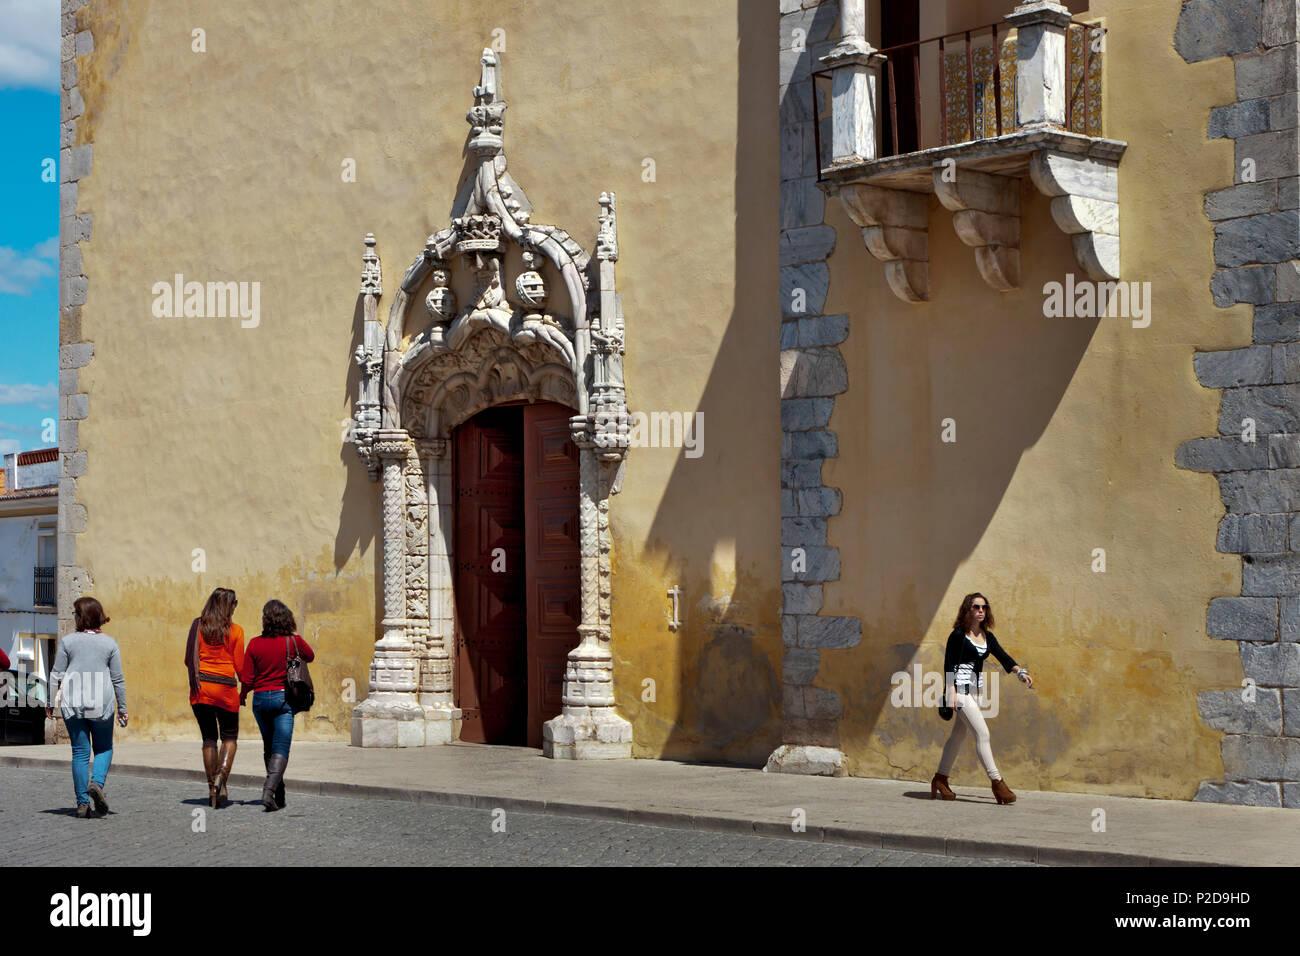 Eingang einer Kirche, Moura, Alentejo, Portugal Stockbild